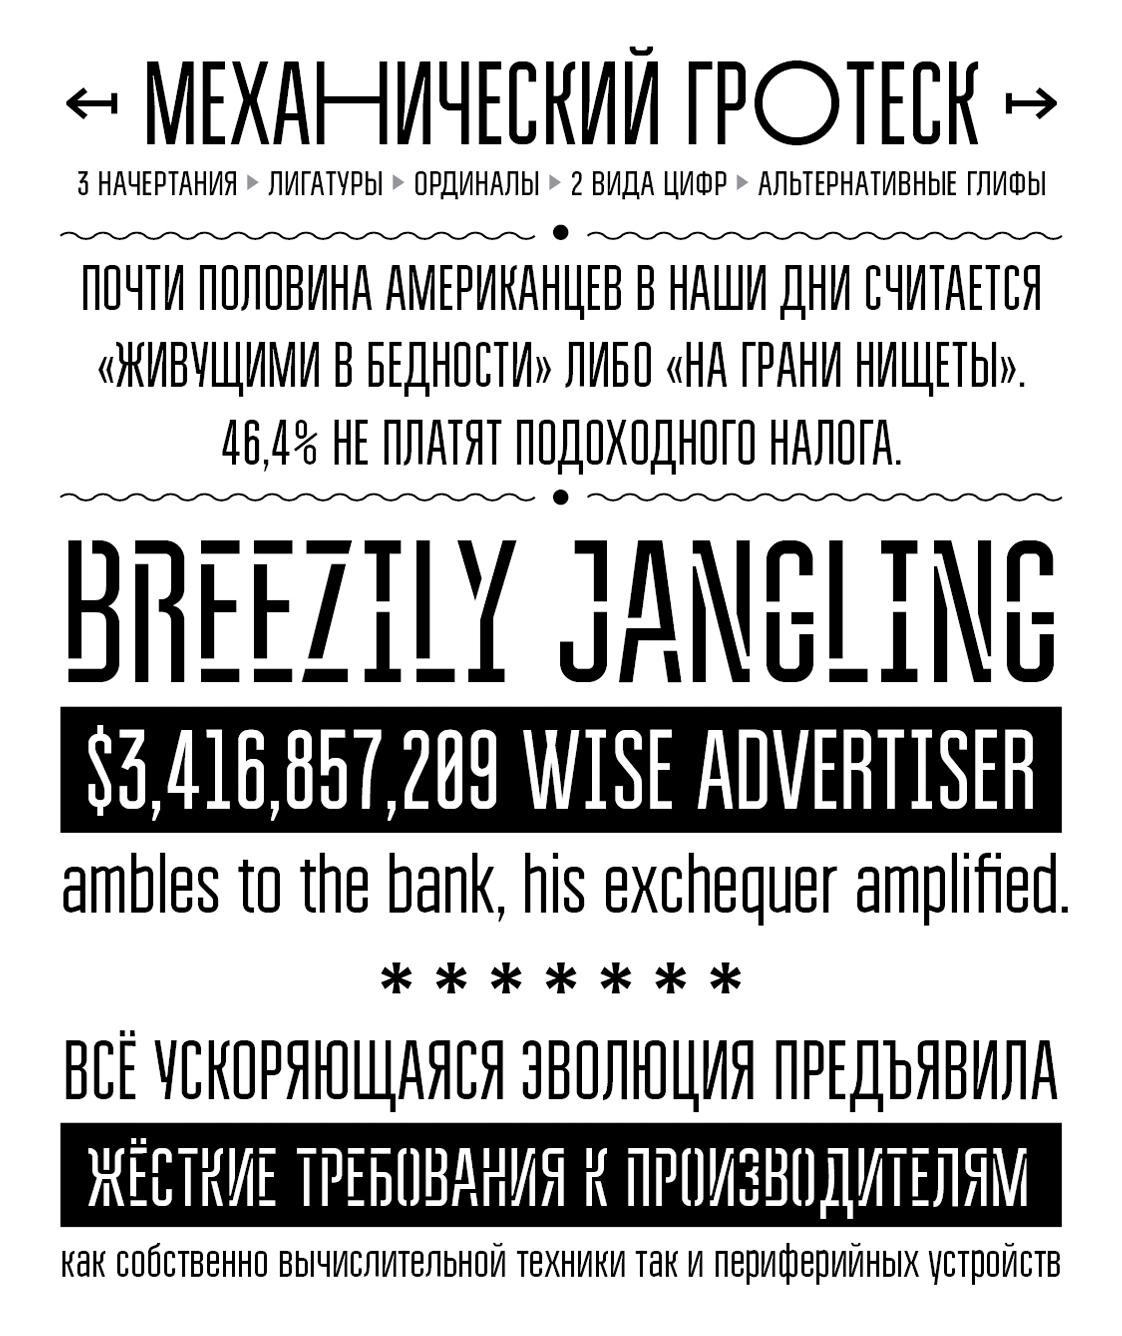 Cyrillic type fonts accidental  grotesque bravo text Title Headline alphabet Russia ekaterinburg free sans